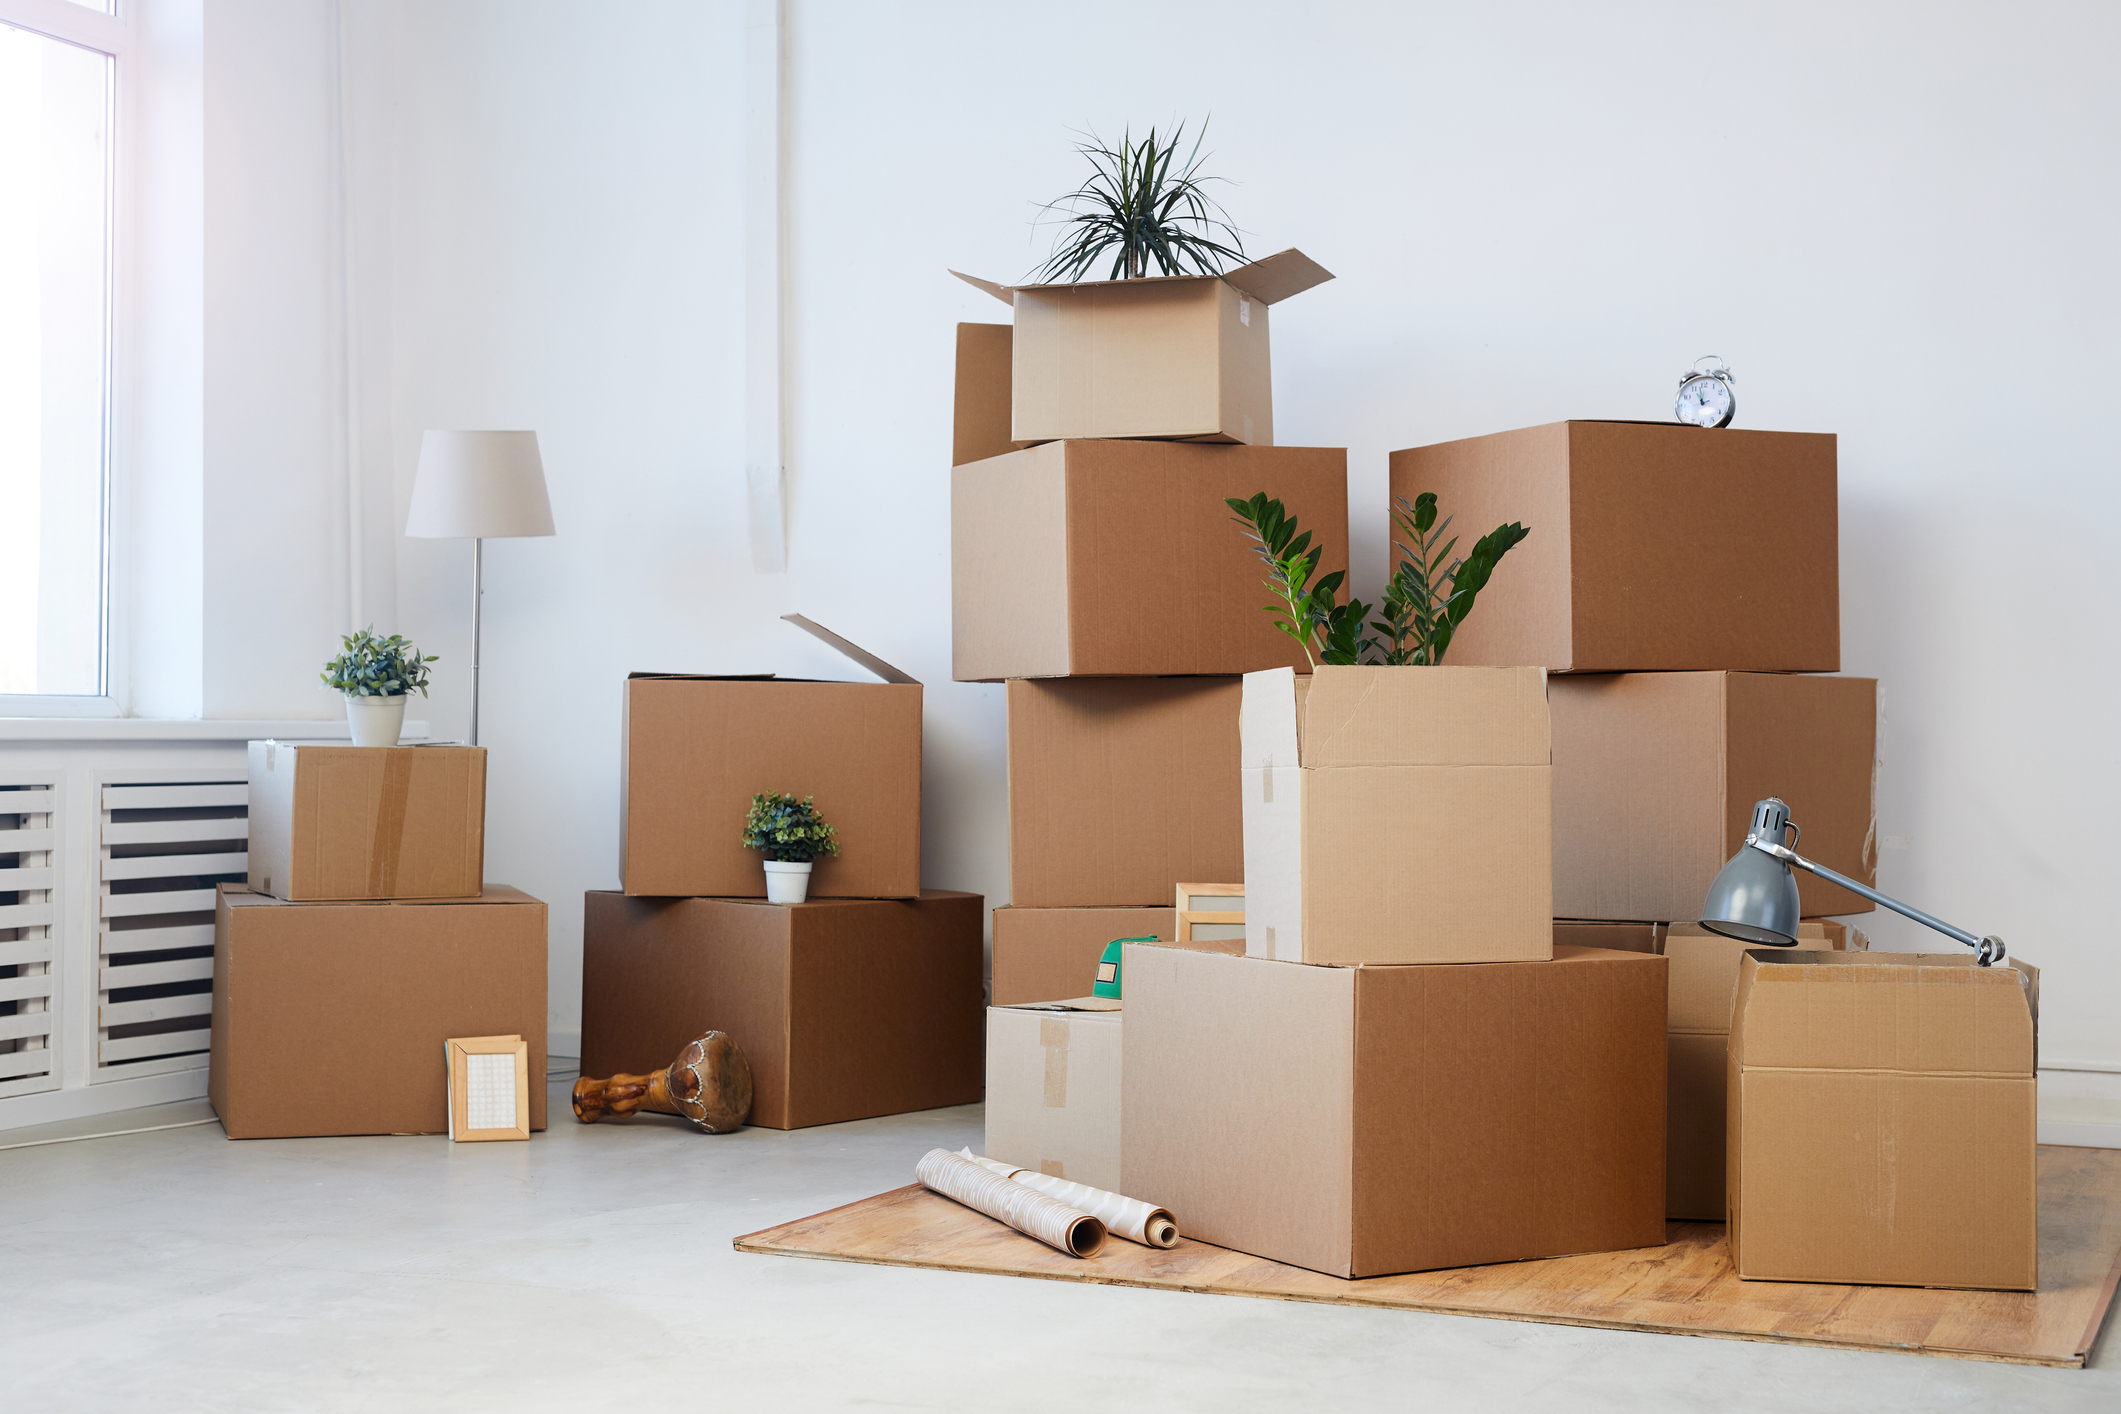 representing Moving